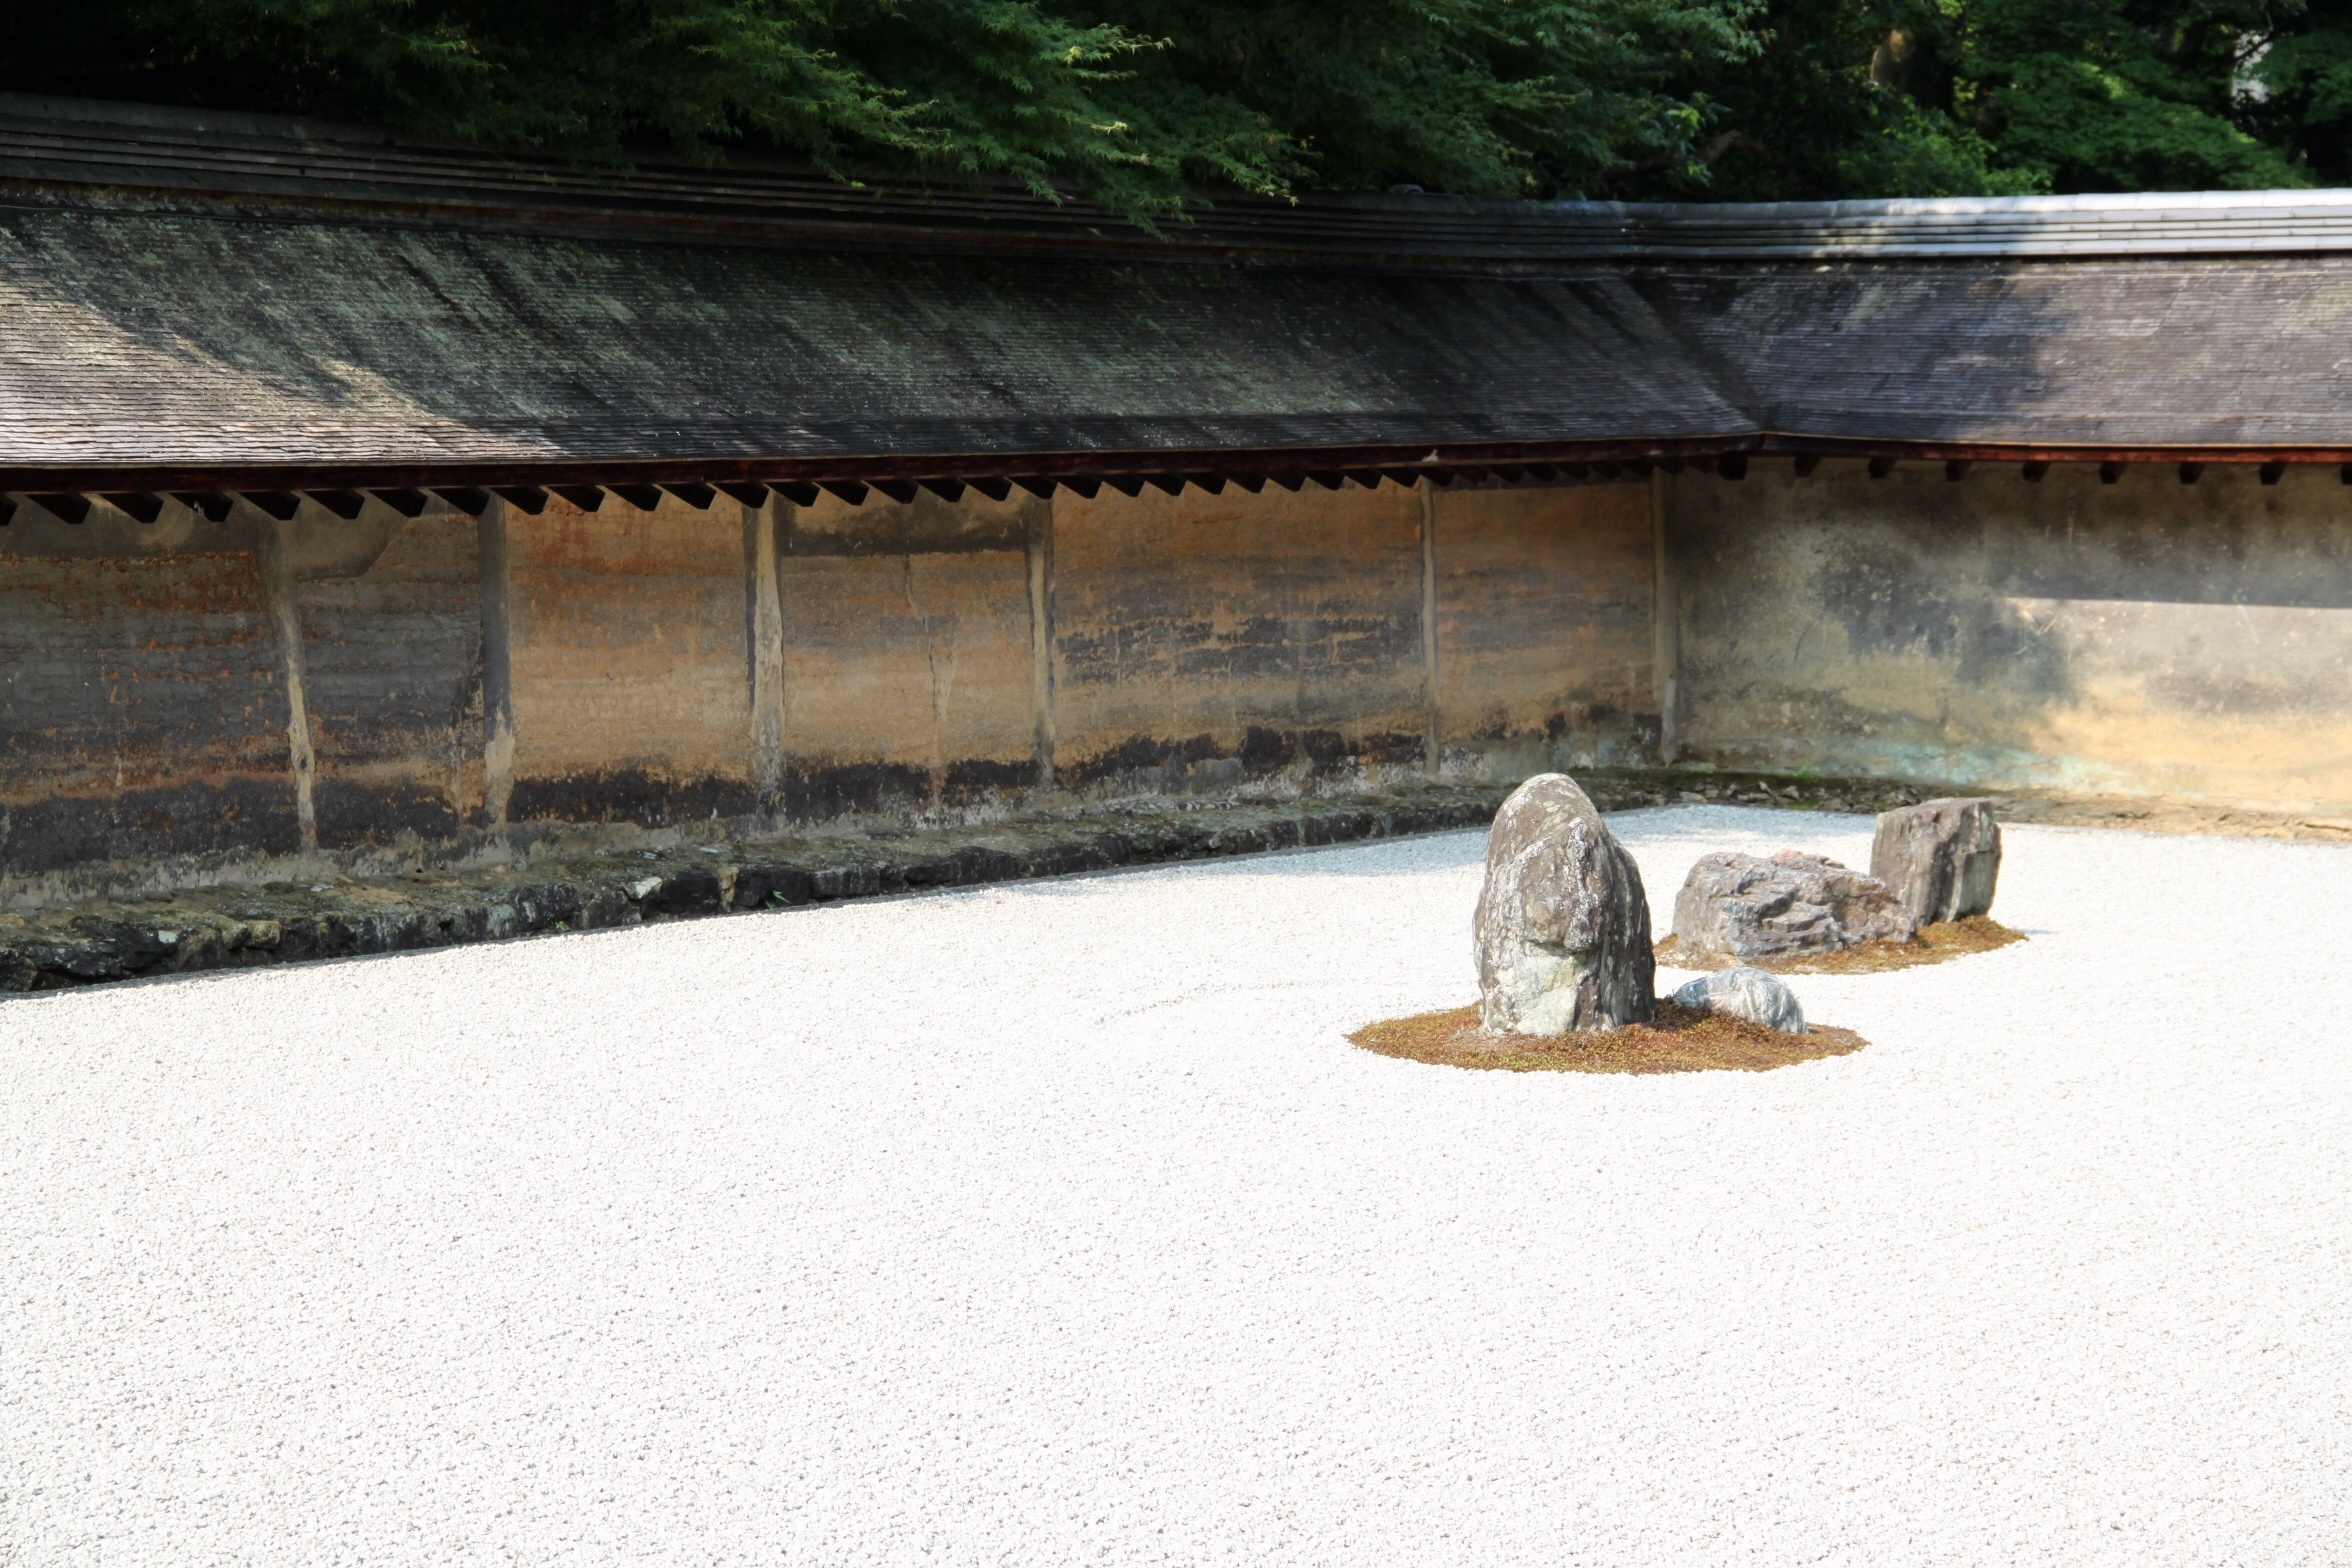 Japan Zen Reise Ryuanji Tempel Steingarten gepflasterte Mauer